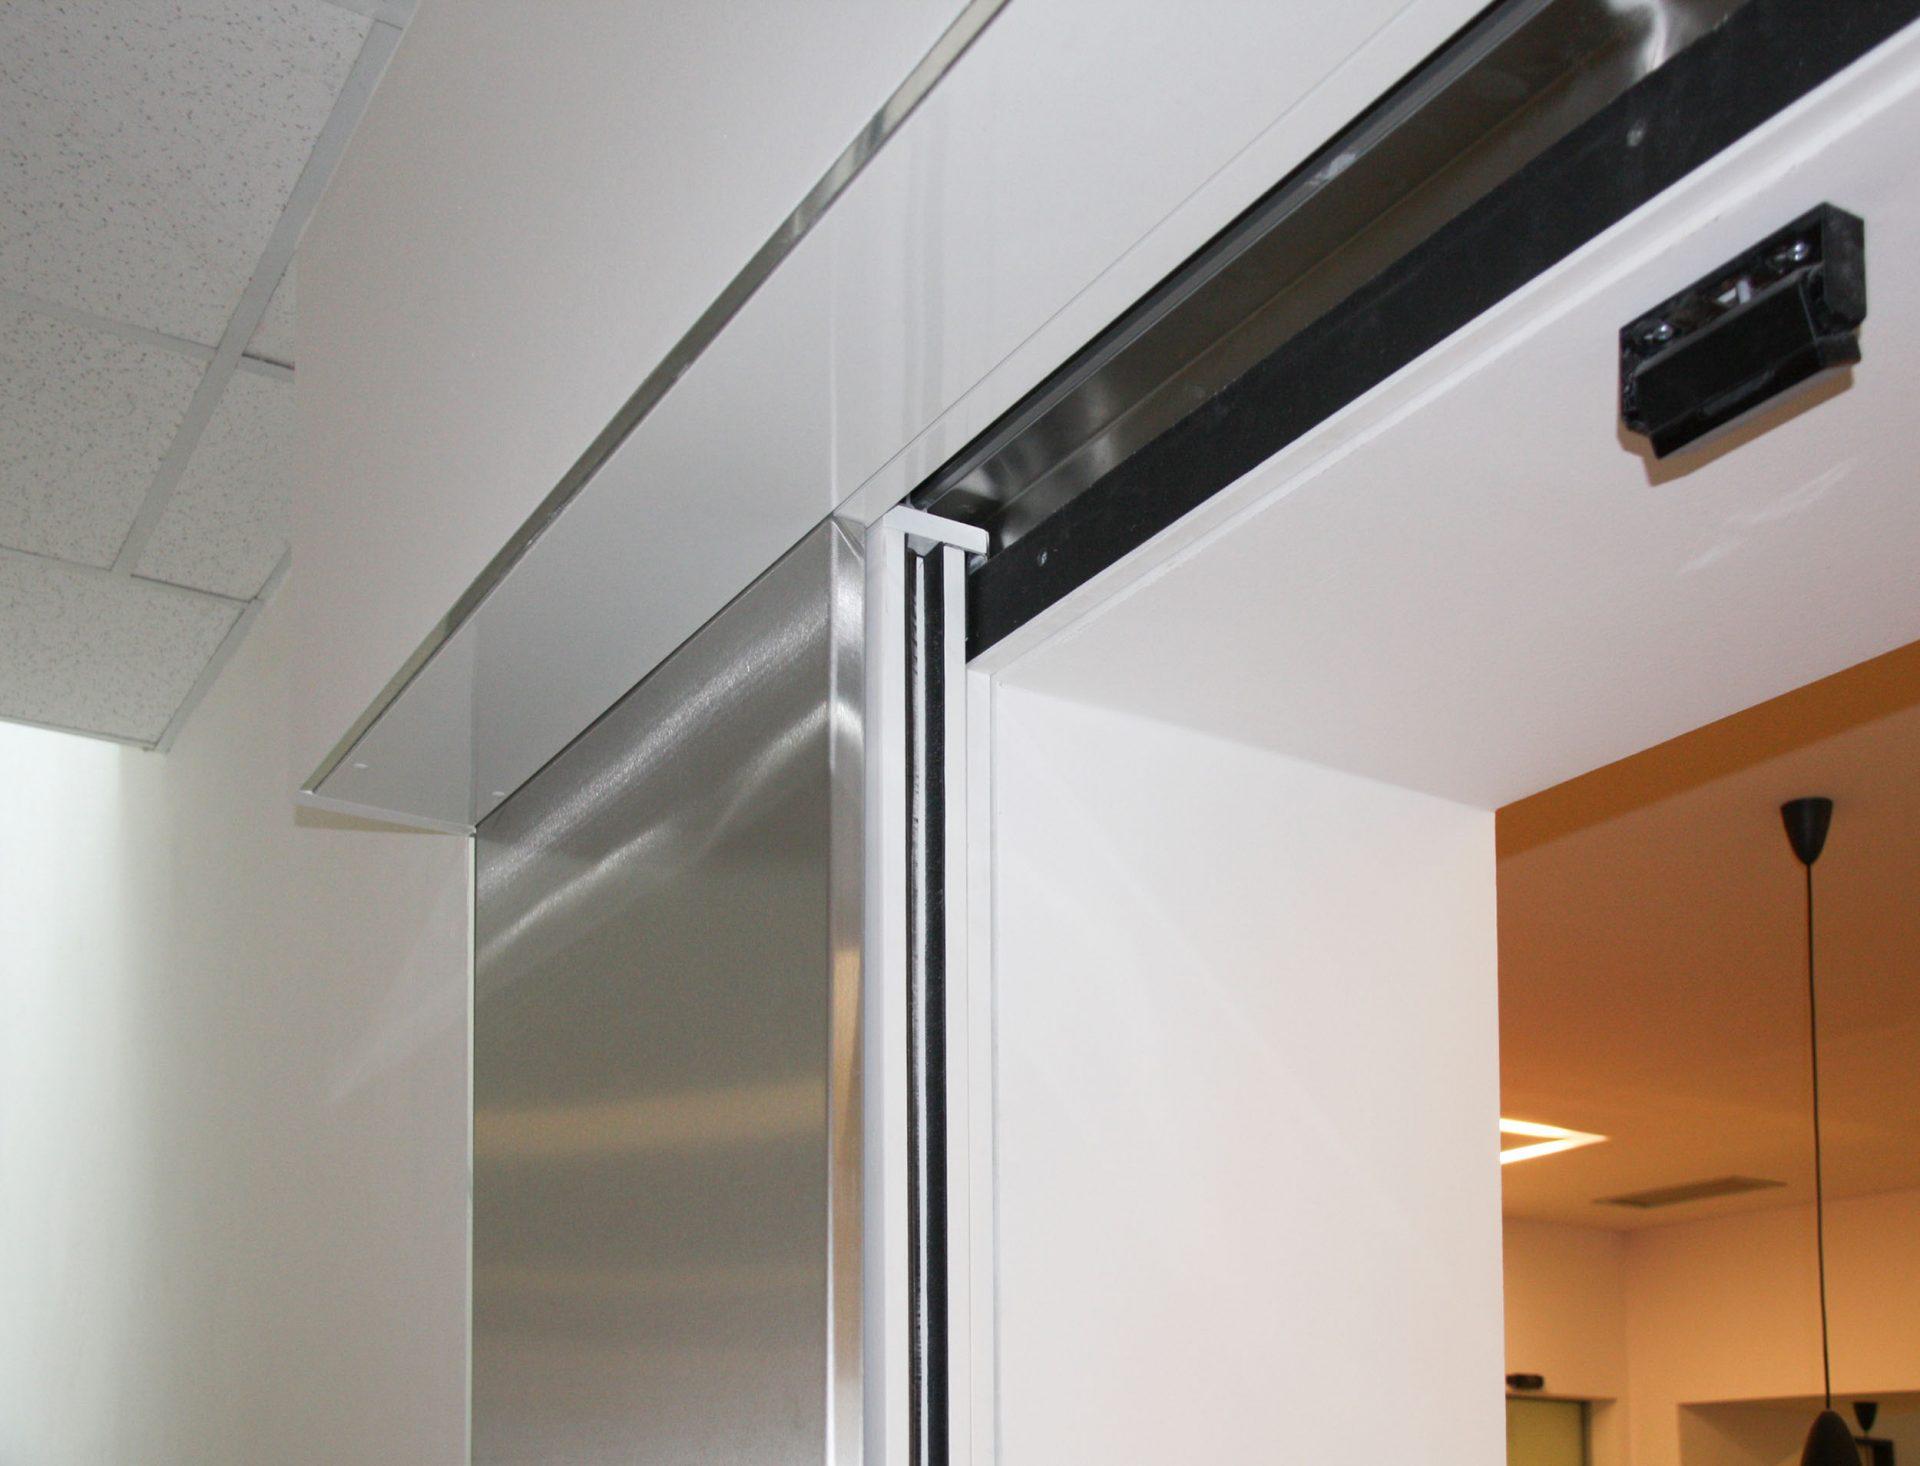 automatische brandschutzt ren automatische t ren glas. Black Bedroom Furniture Sets. Home Design Ideas